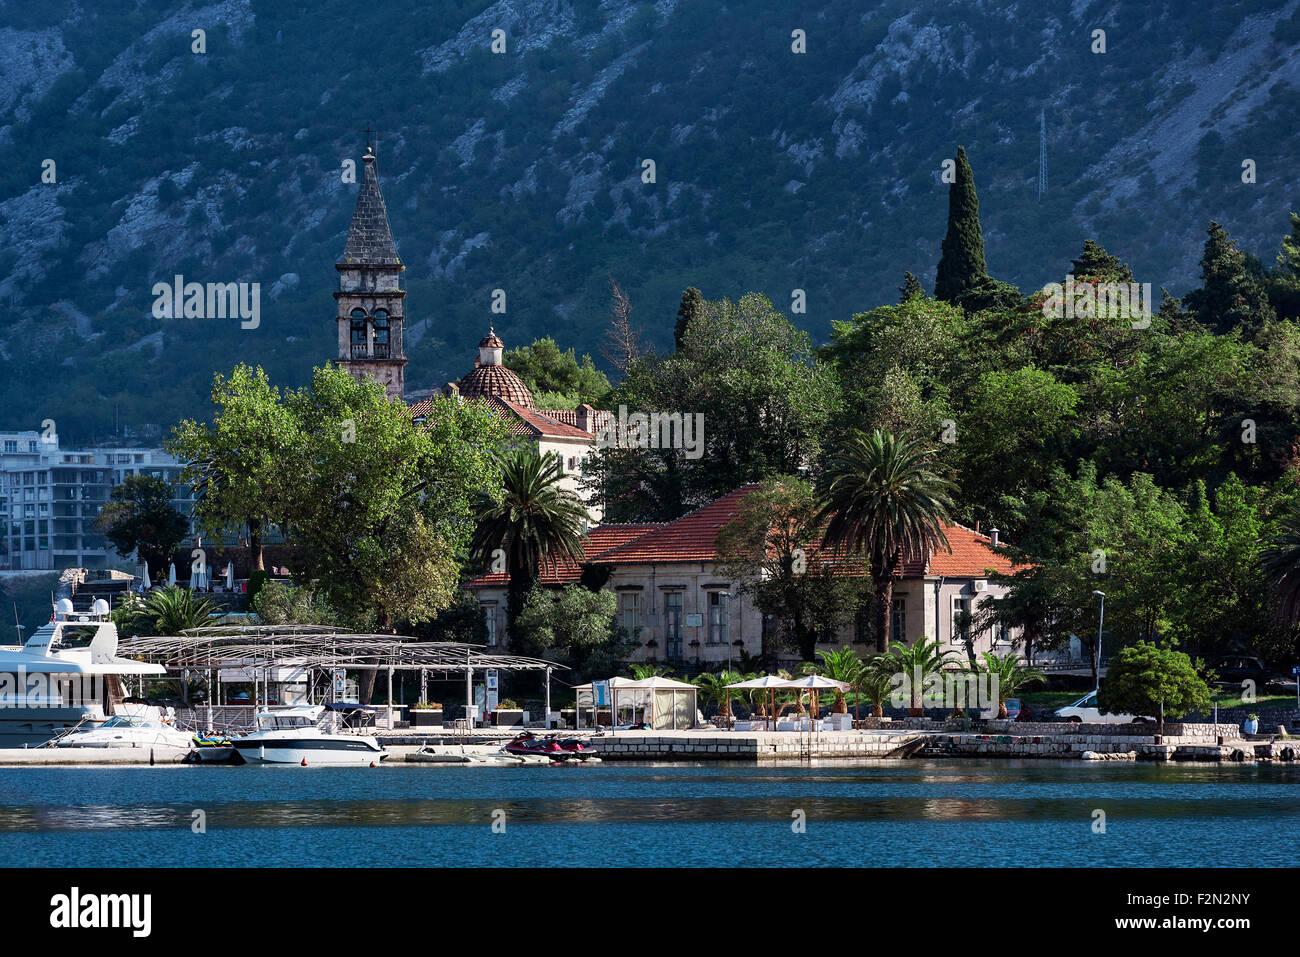 Waterfront church, Bay of Kotor, Montenegro Stock Photo